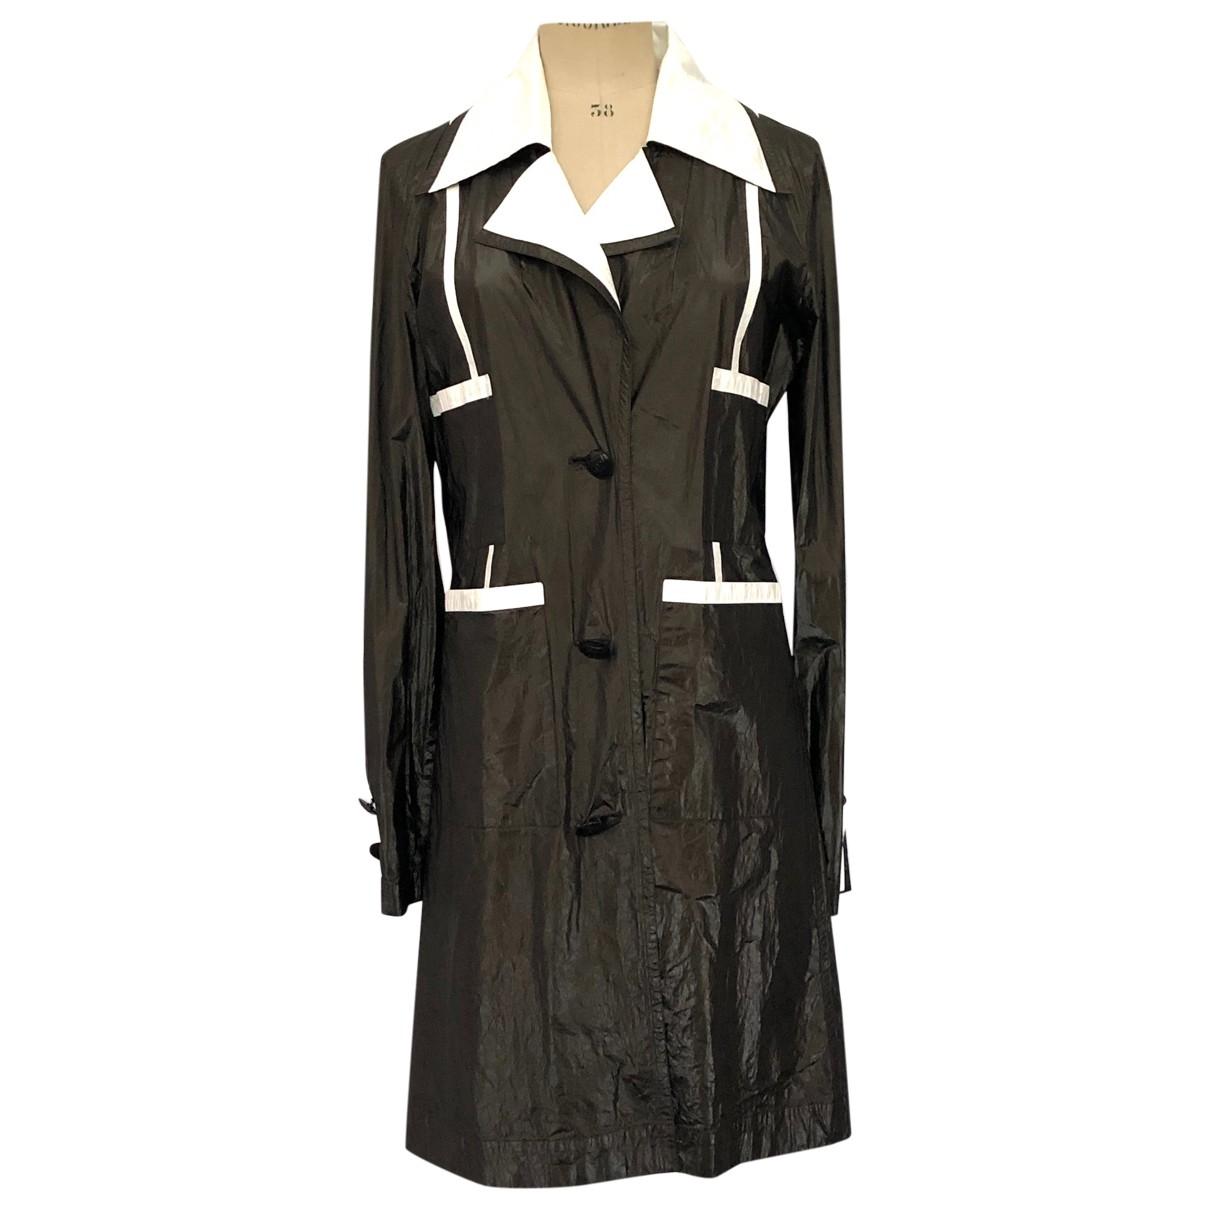 Chanel \N Black coat for Women XS International